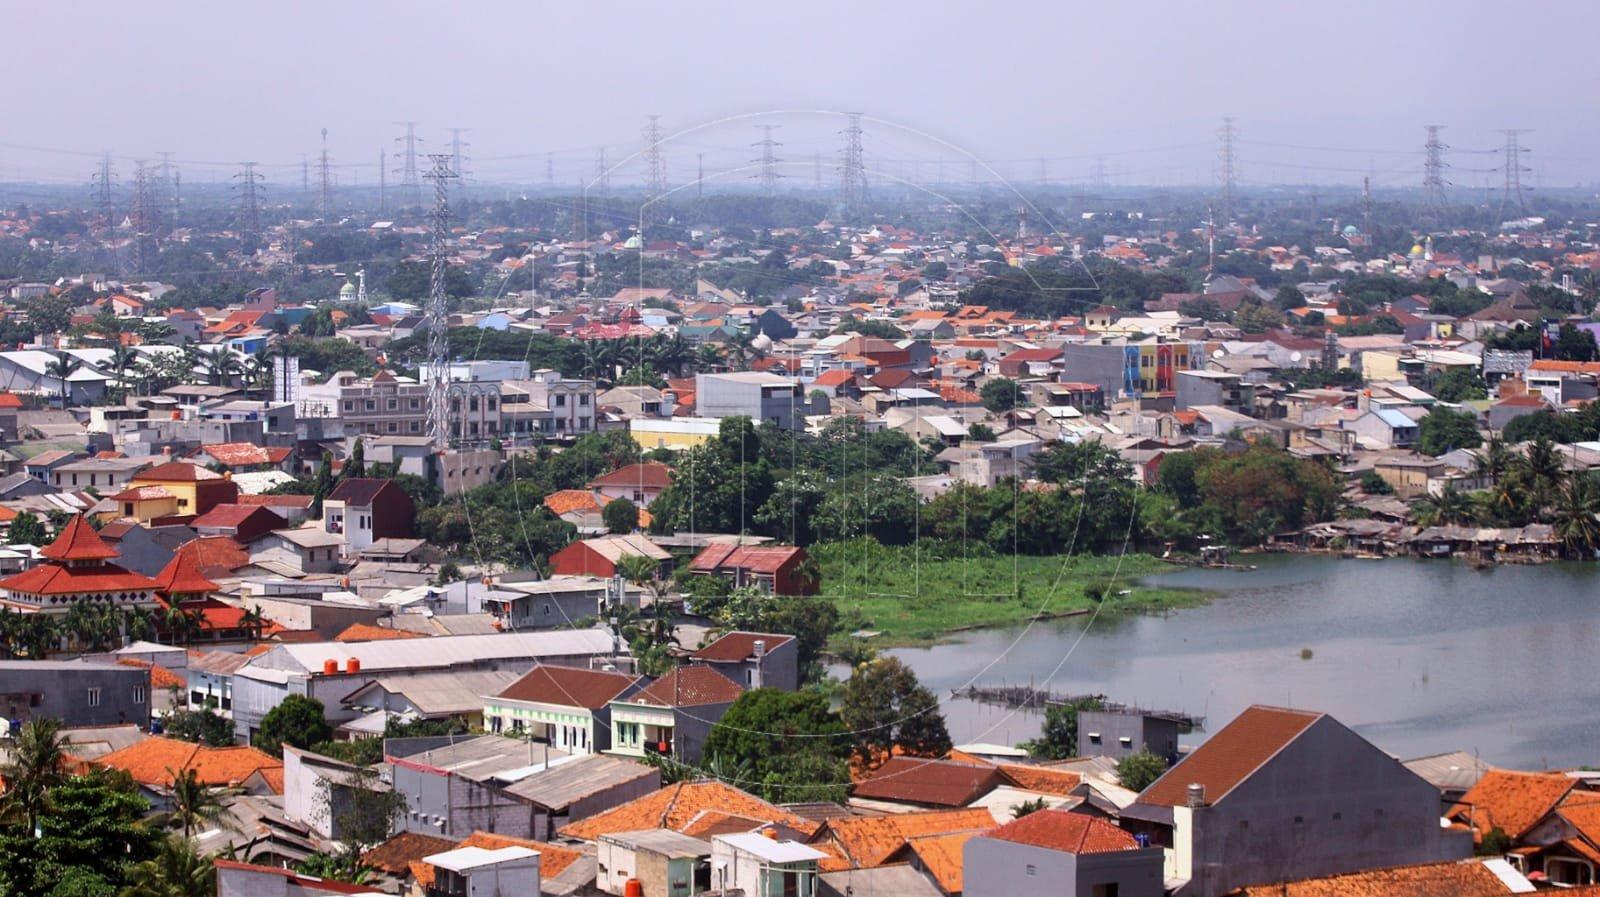 Perkembangan Hunian di Kota Depok Harus Seimbang